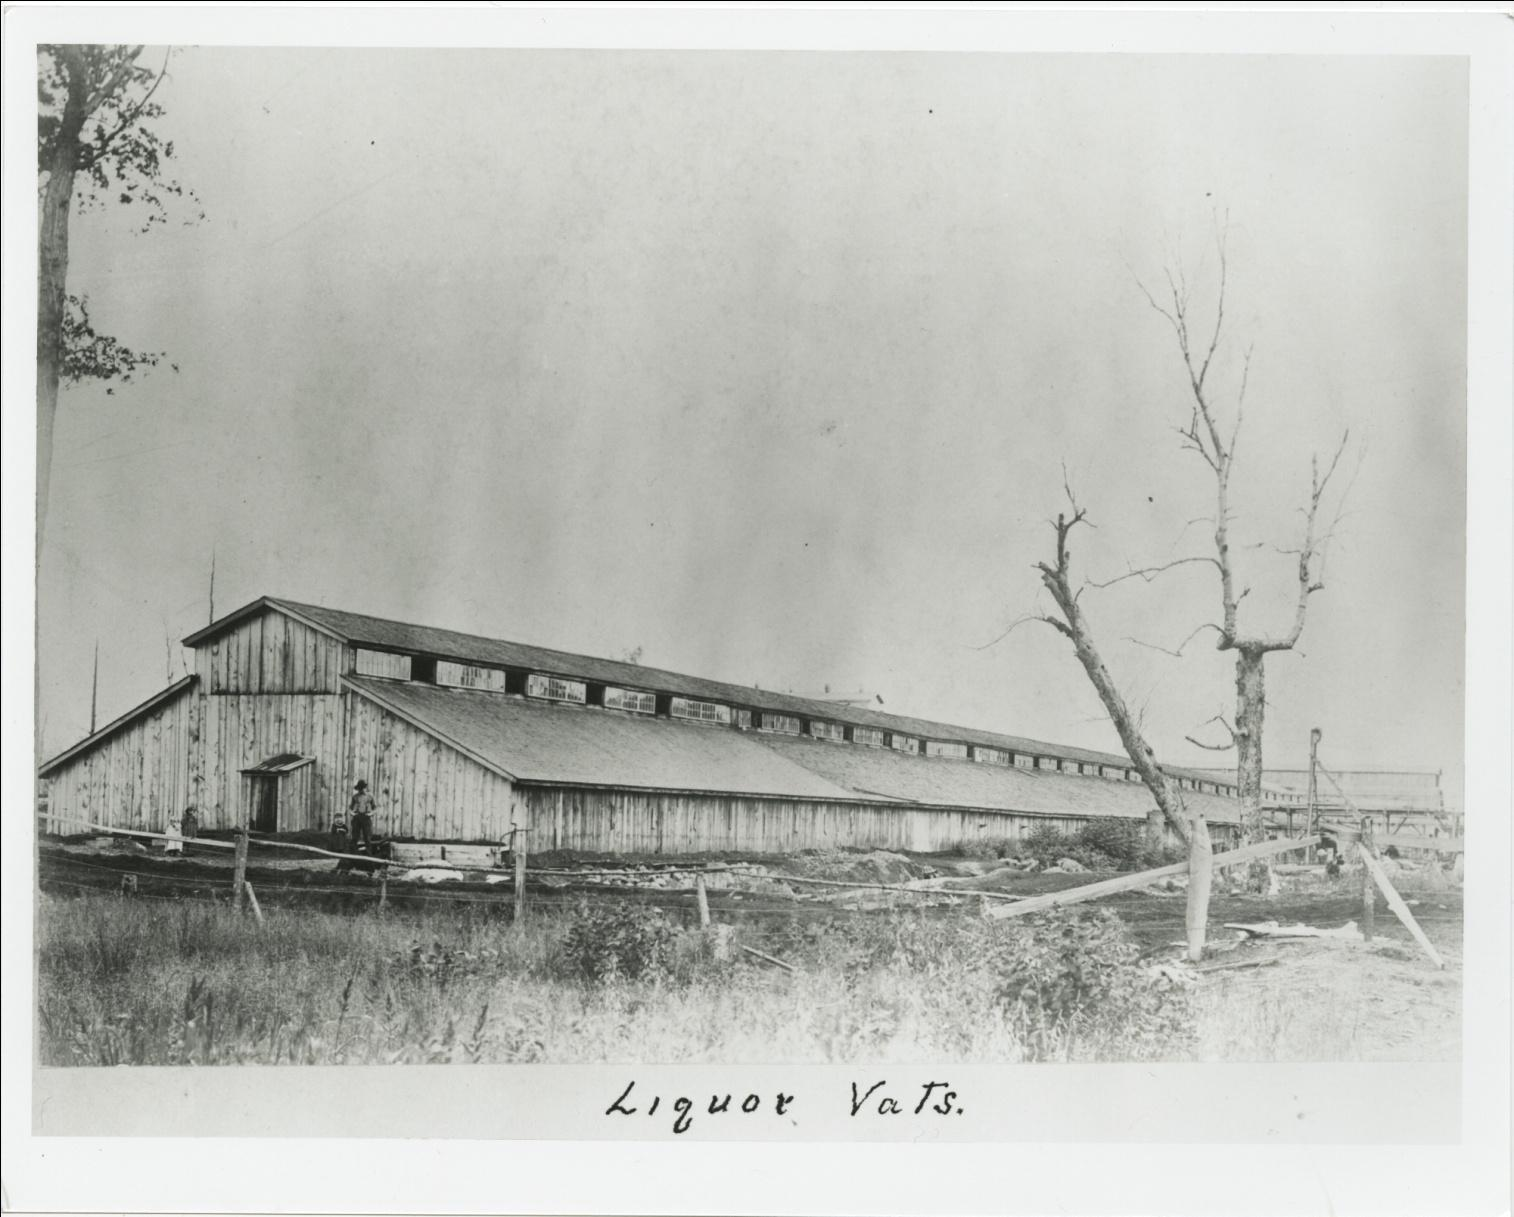 C:\Users\Robert P. Rusch\Desktop\II. RLHSoc\Documents & Photos-Scanned\Rib Lake History 10700-10799\10790-P. Tannery_ liquor vats building c. 1900.jpg